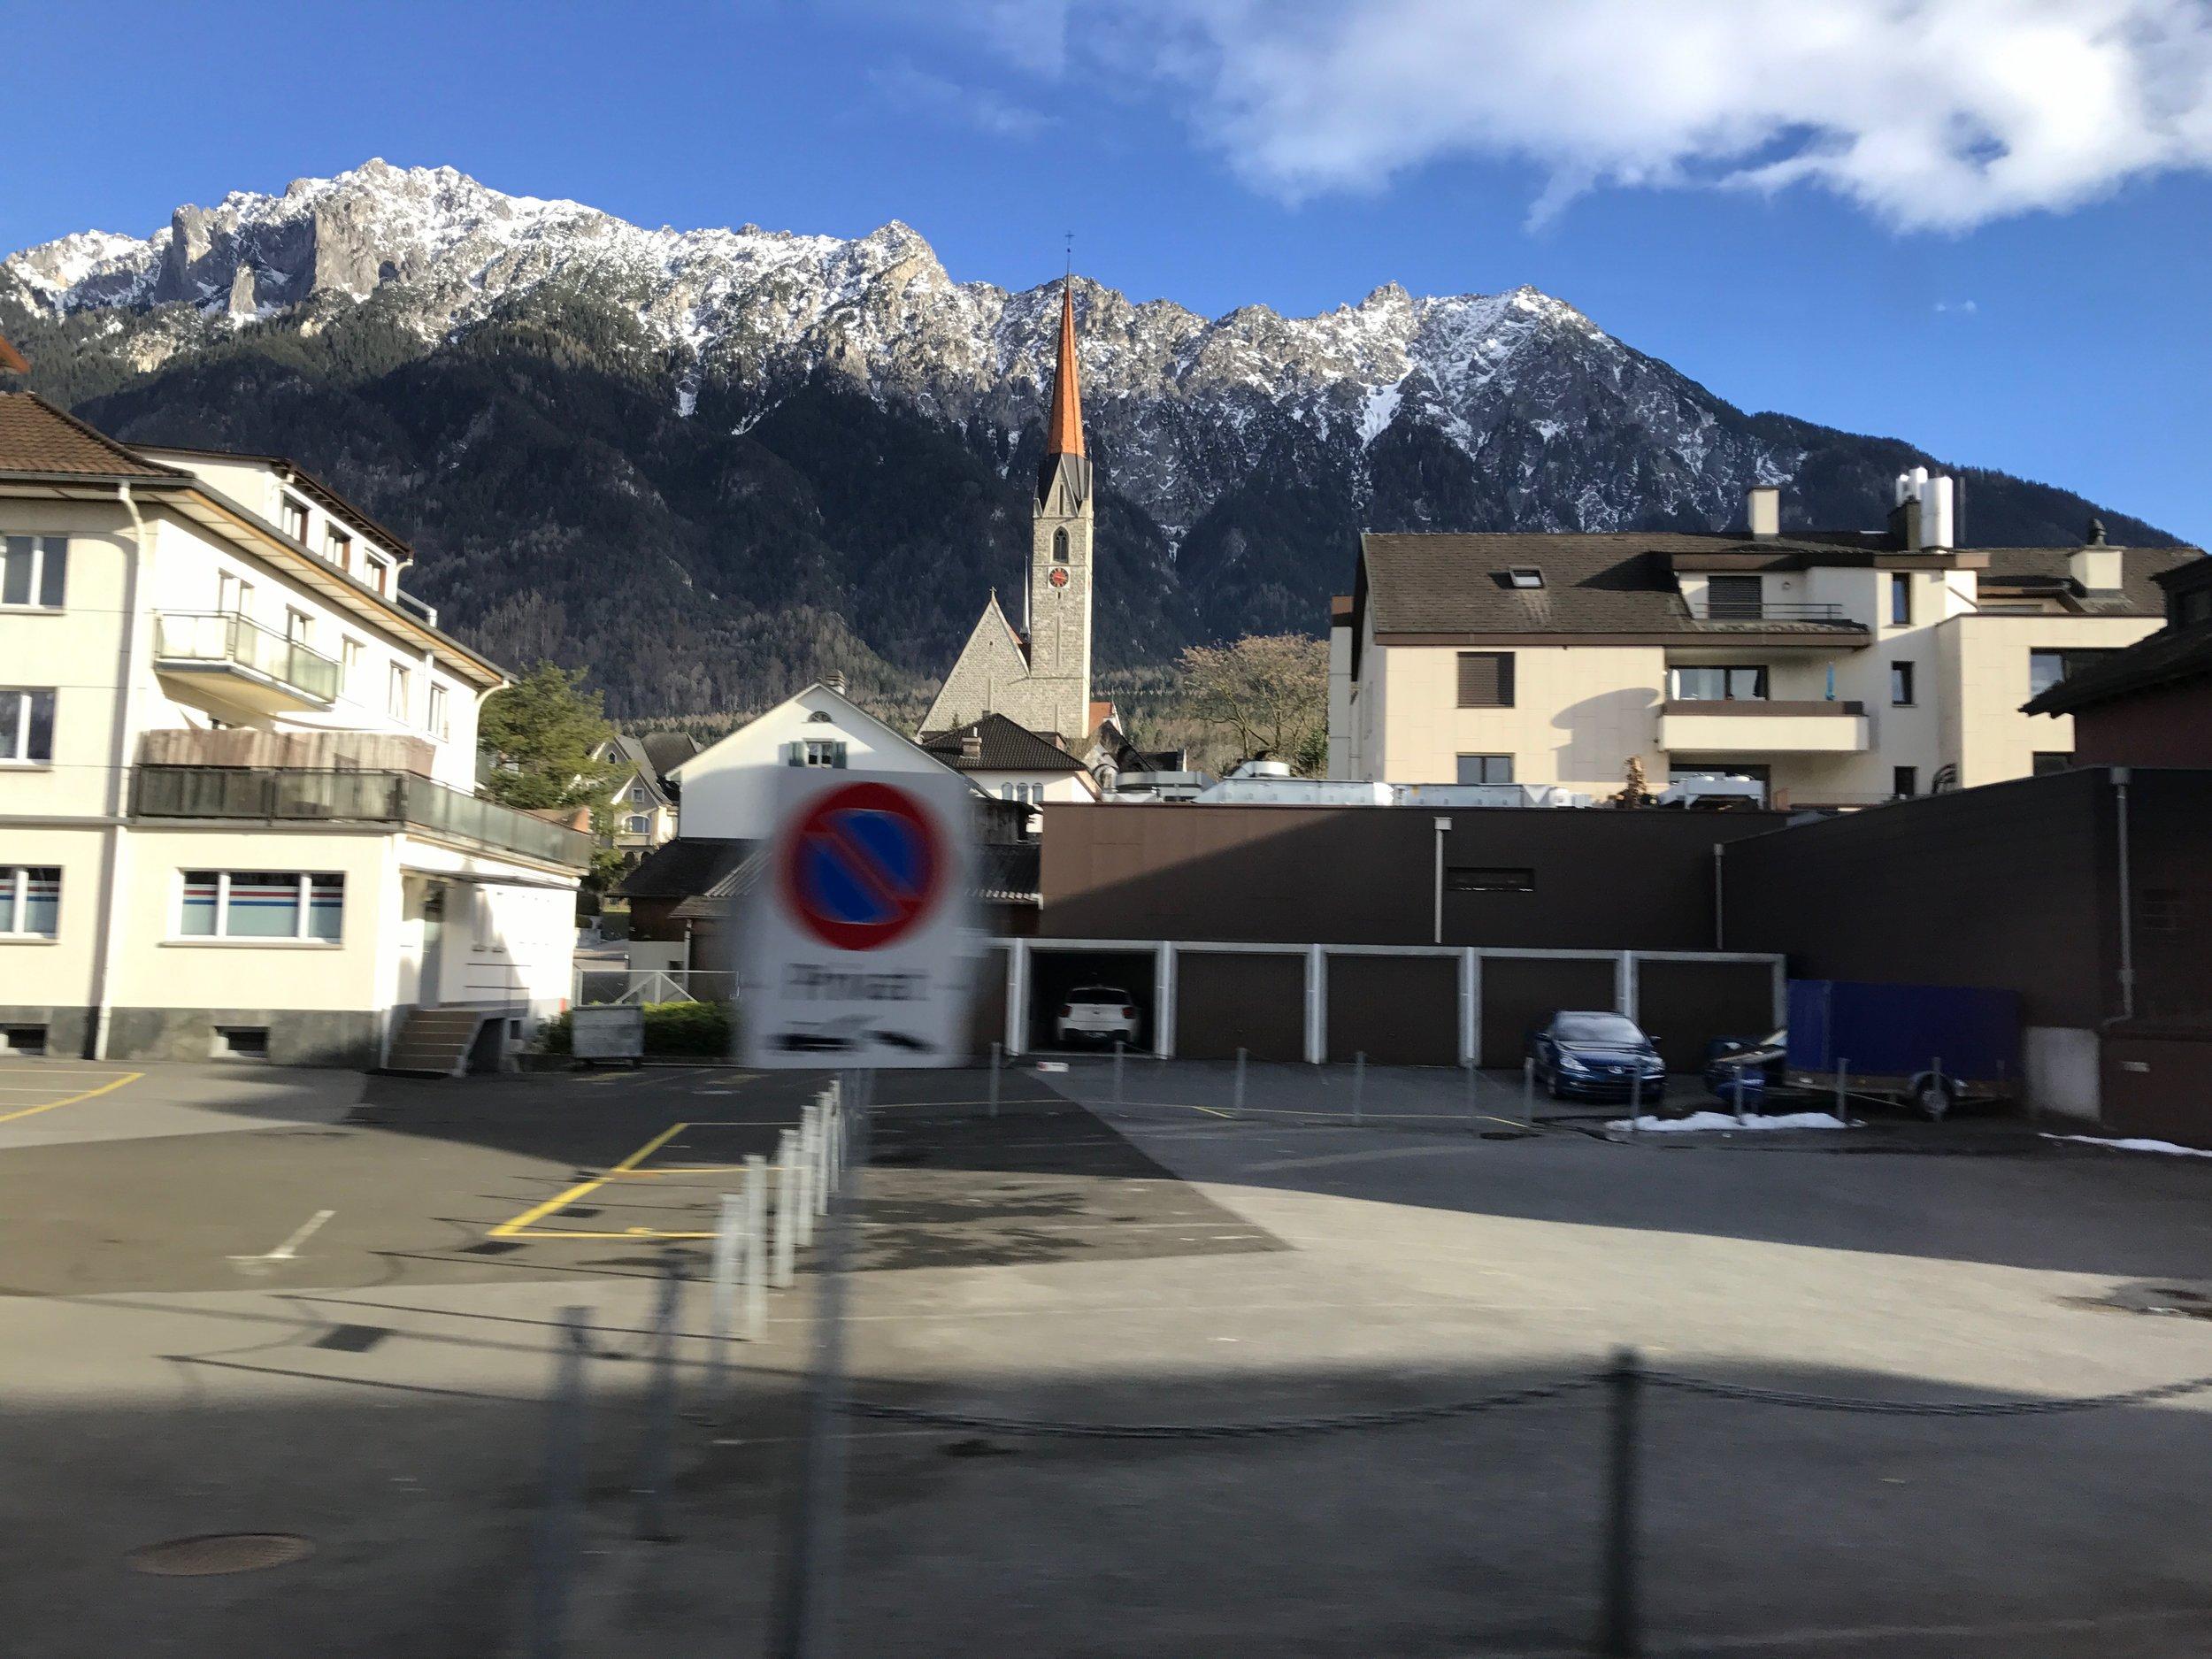 Our driver whisks us through Schaan,largest municipality of Liechtenstein.